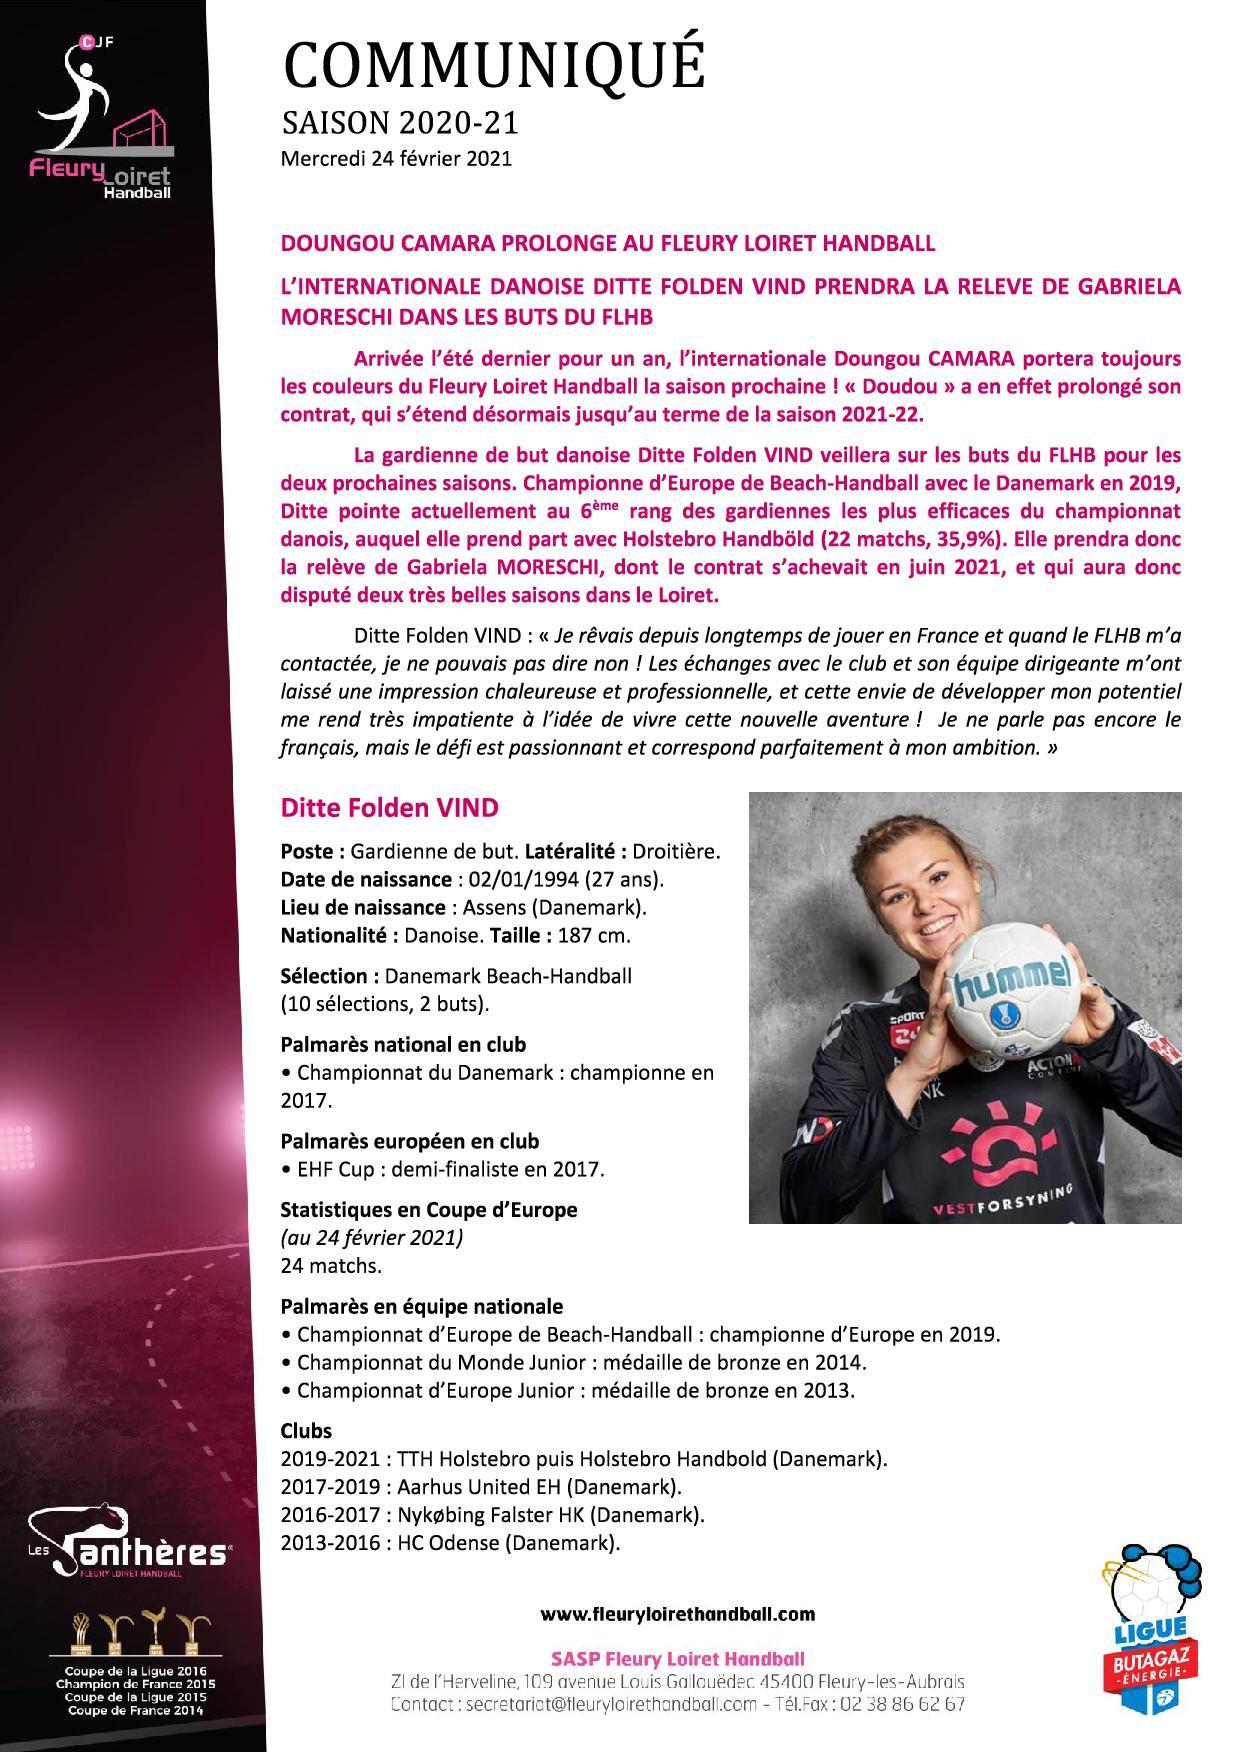 Communiqué Fleury Loiret Handball - Mercredi 24 février 20211.jpg